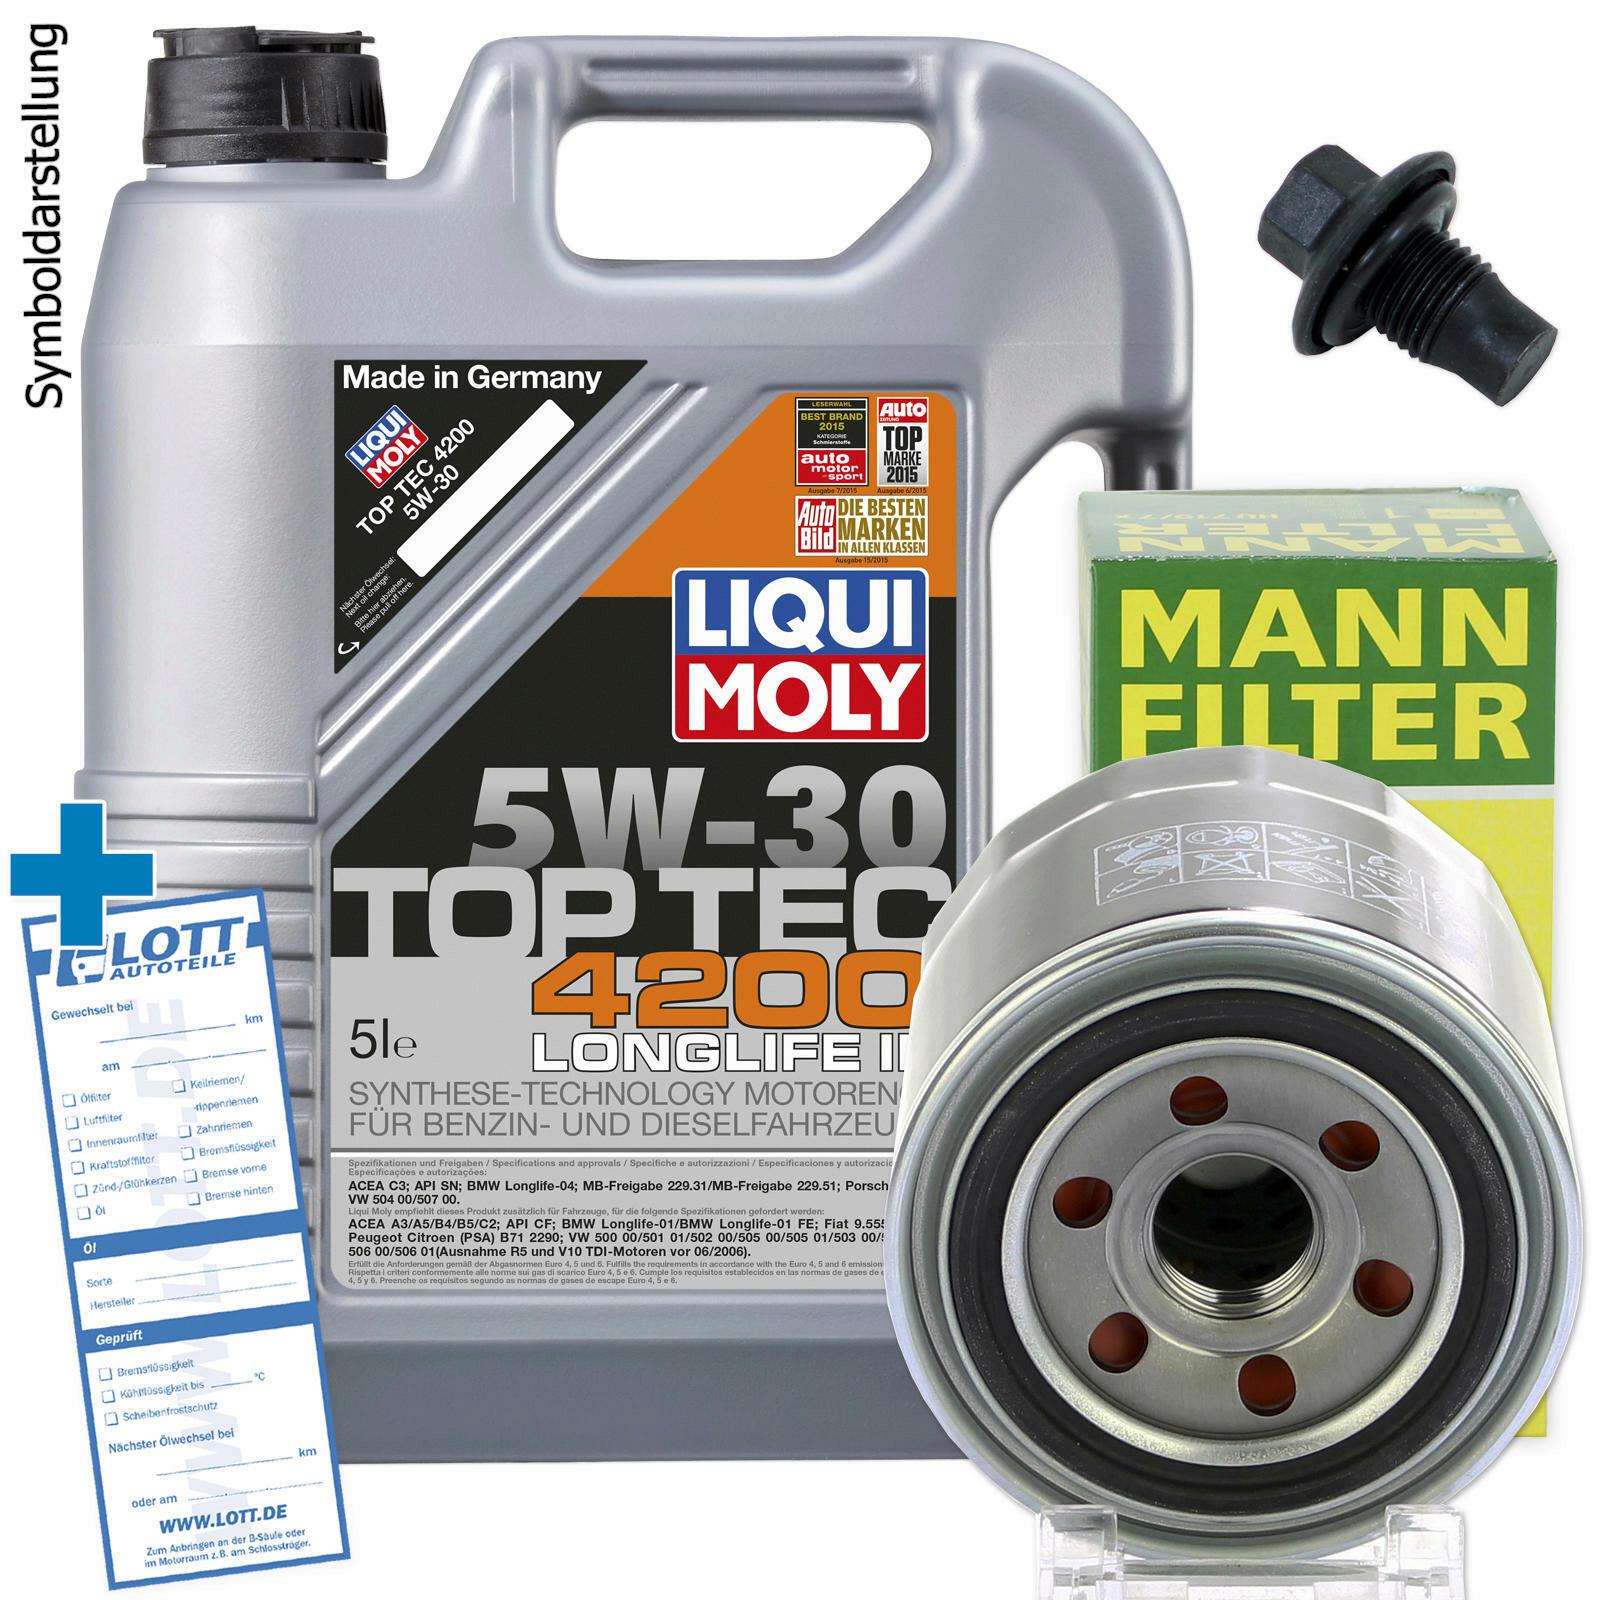 MANN Kraftstofffilter Hyundai ix20 i30 CRDi CW Kia Venga 1,4-2,0